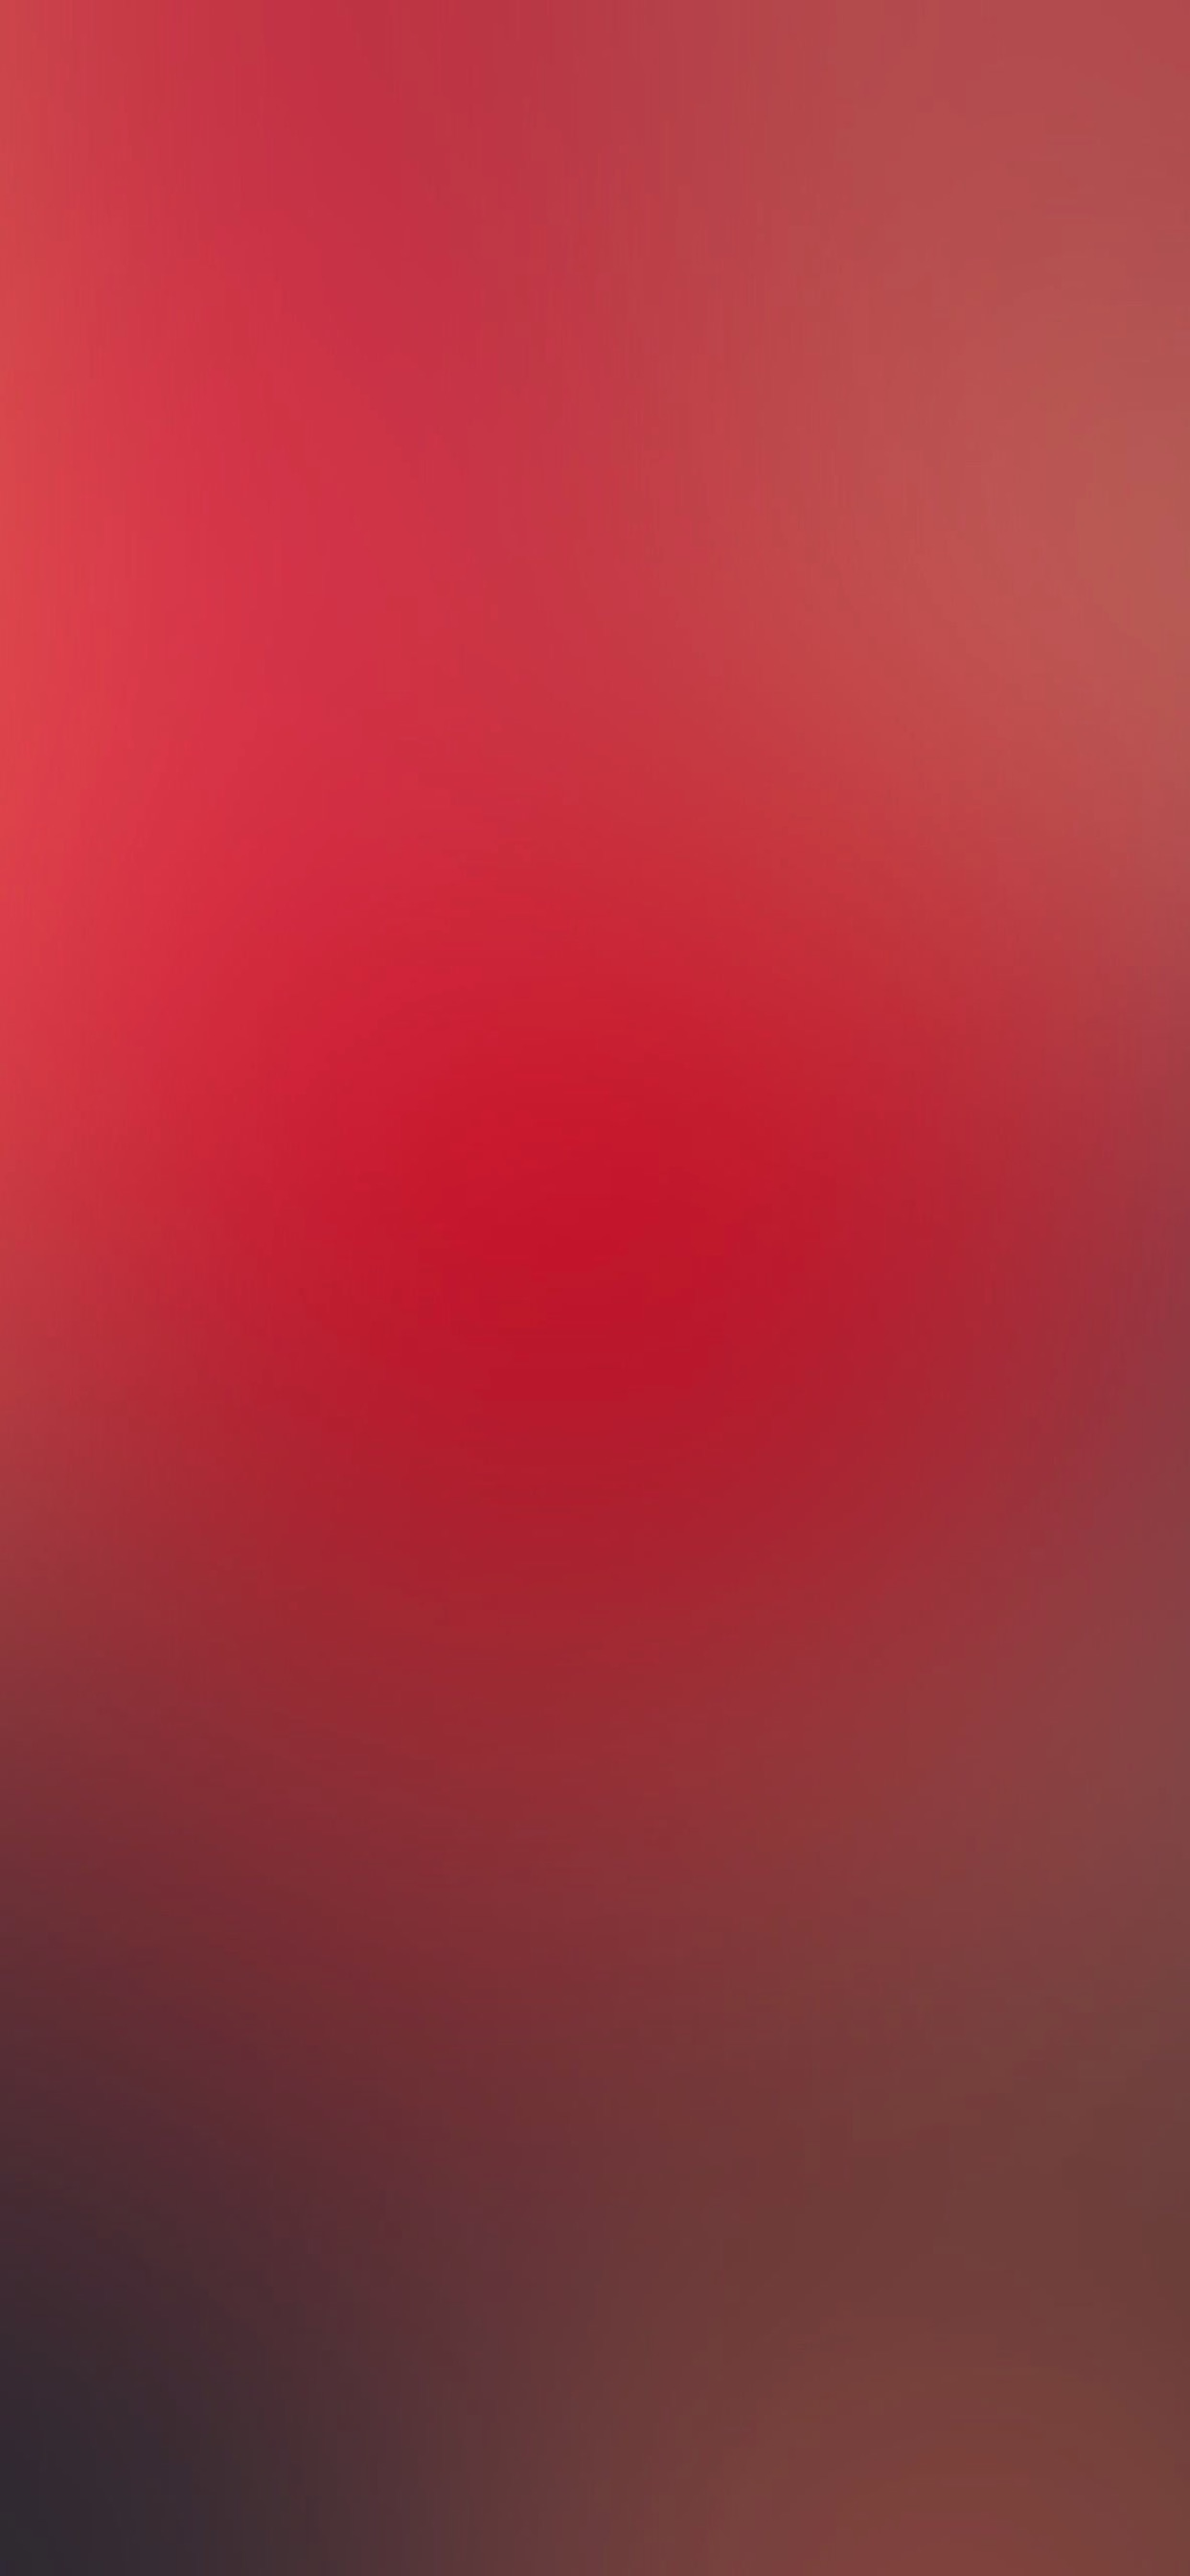 iPhone XS Max 壁紙 wallpaper 0439